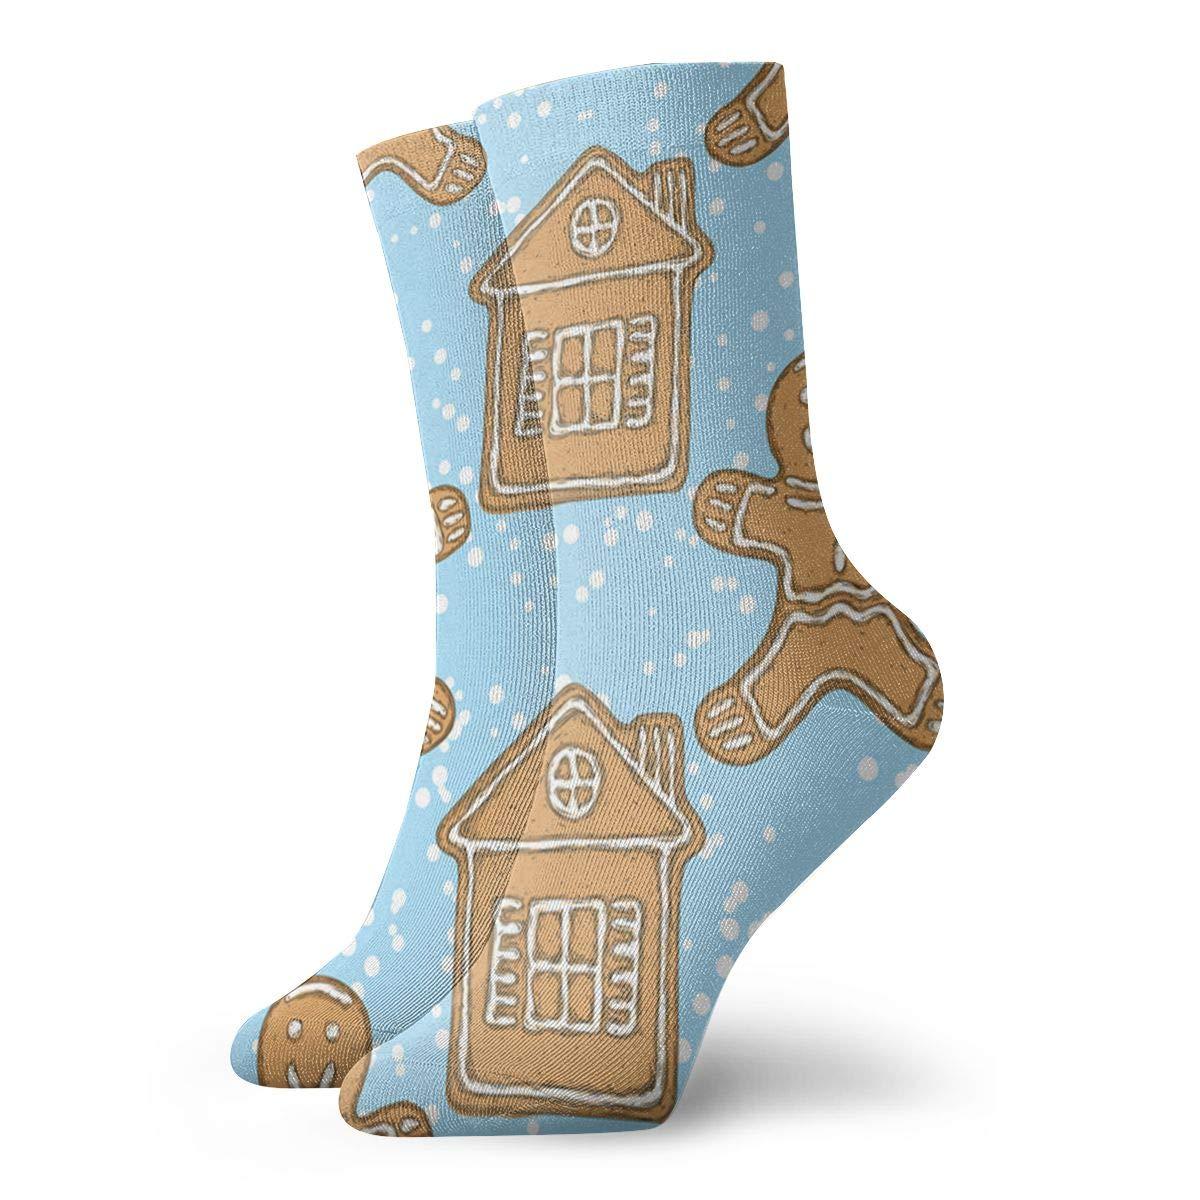 Seamless-gingerbread-man Unisex Funny Casual Crew Socks Athletic Socks For Boys Girls Kids Teenagers